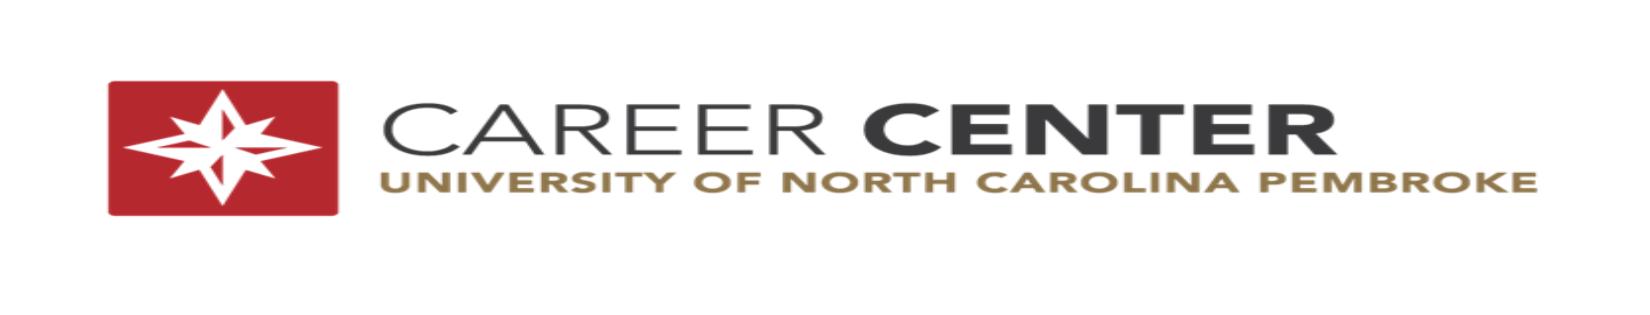 University of North Carolina Pembroke Banner